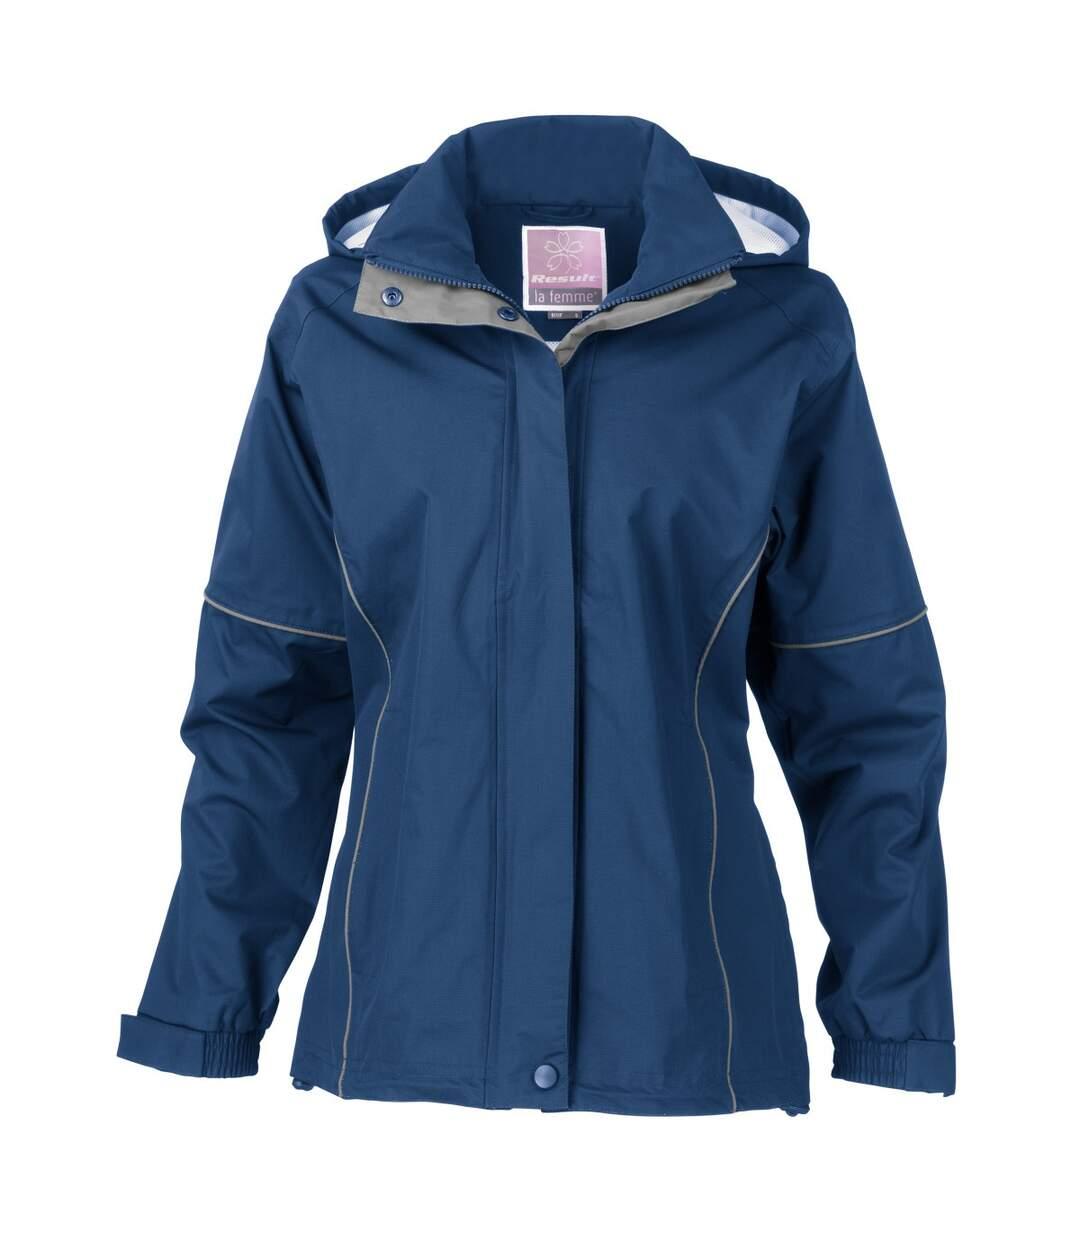 Result Womens/Ladies Urban Fell Lightweight Technical Jacket (Waterproof & Windproof) (Royal) - UTBC3049